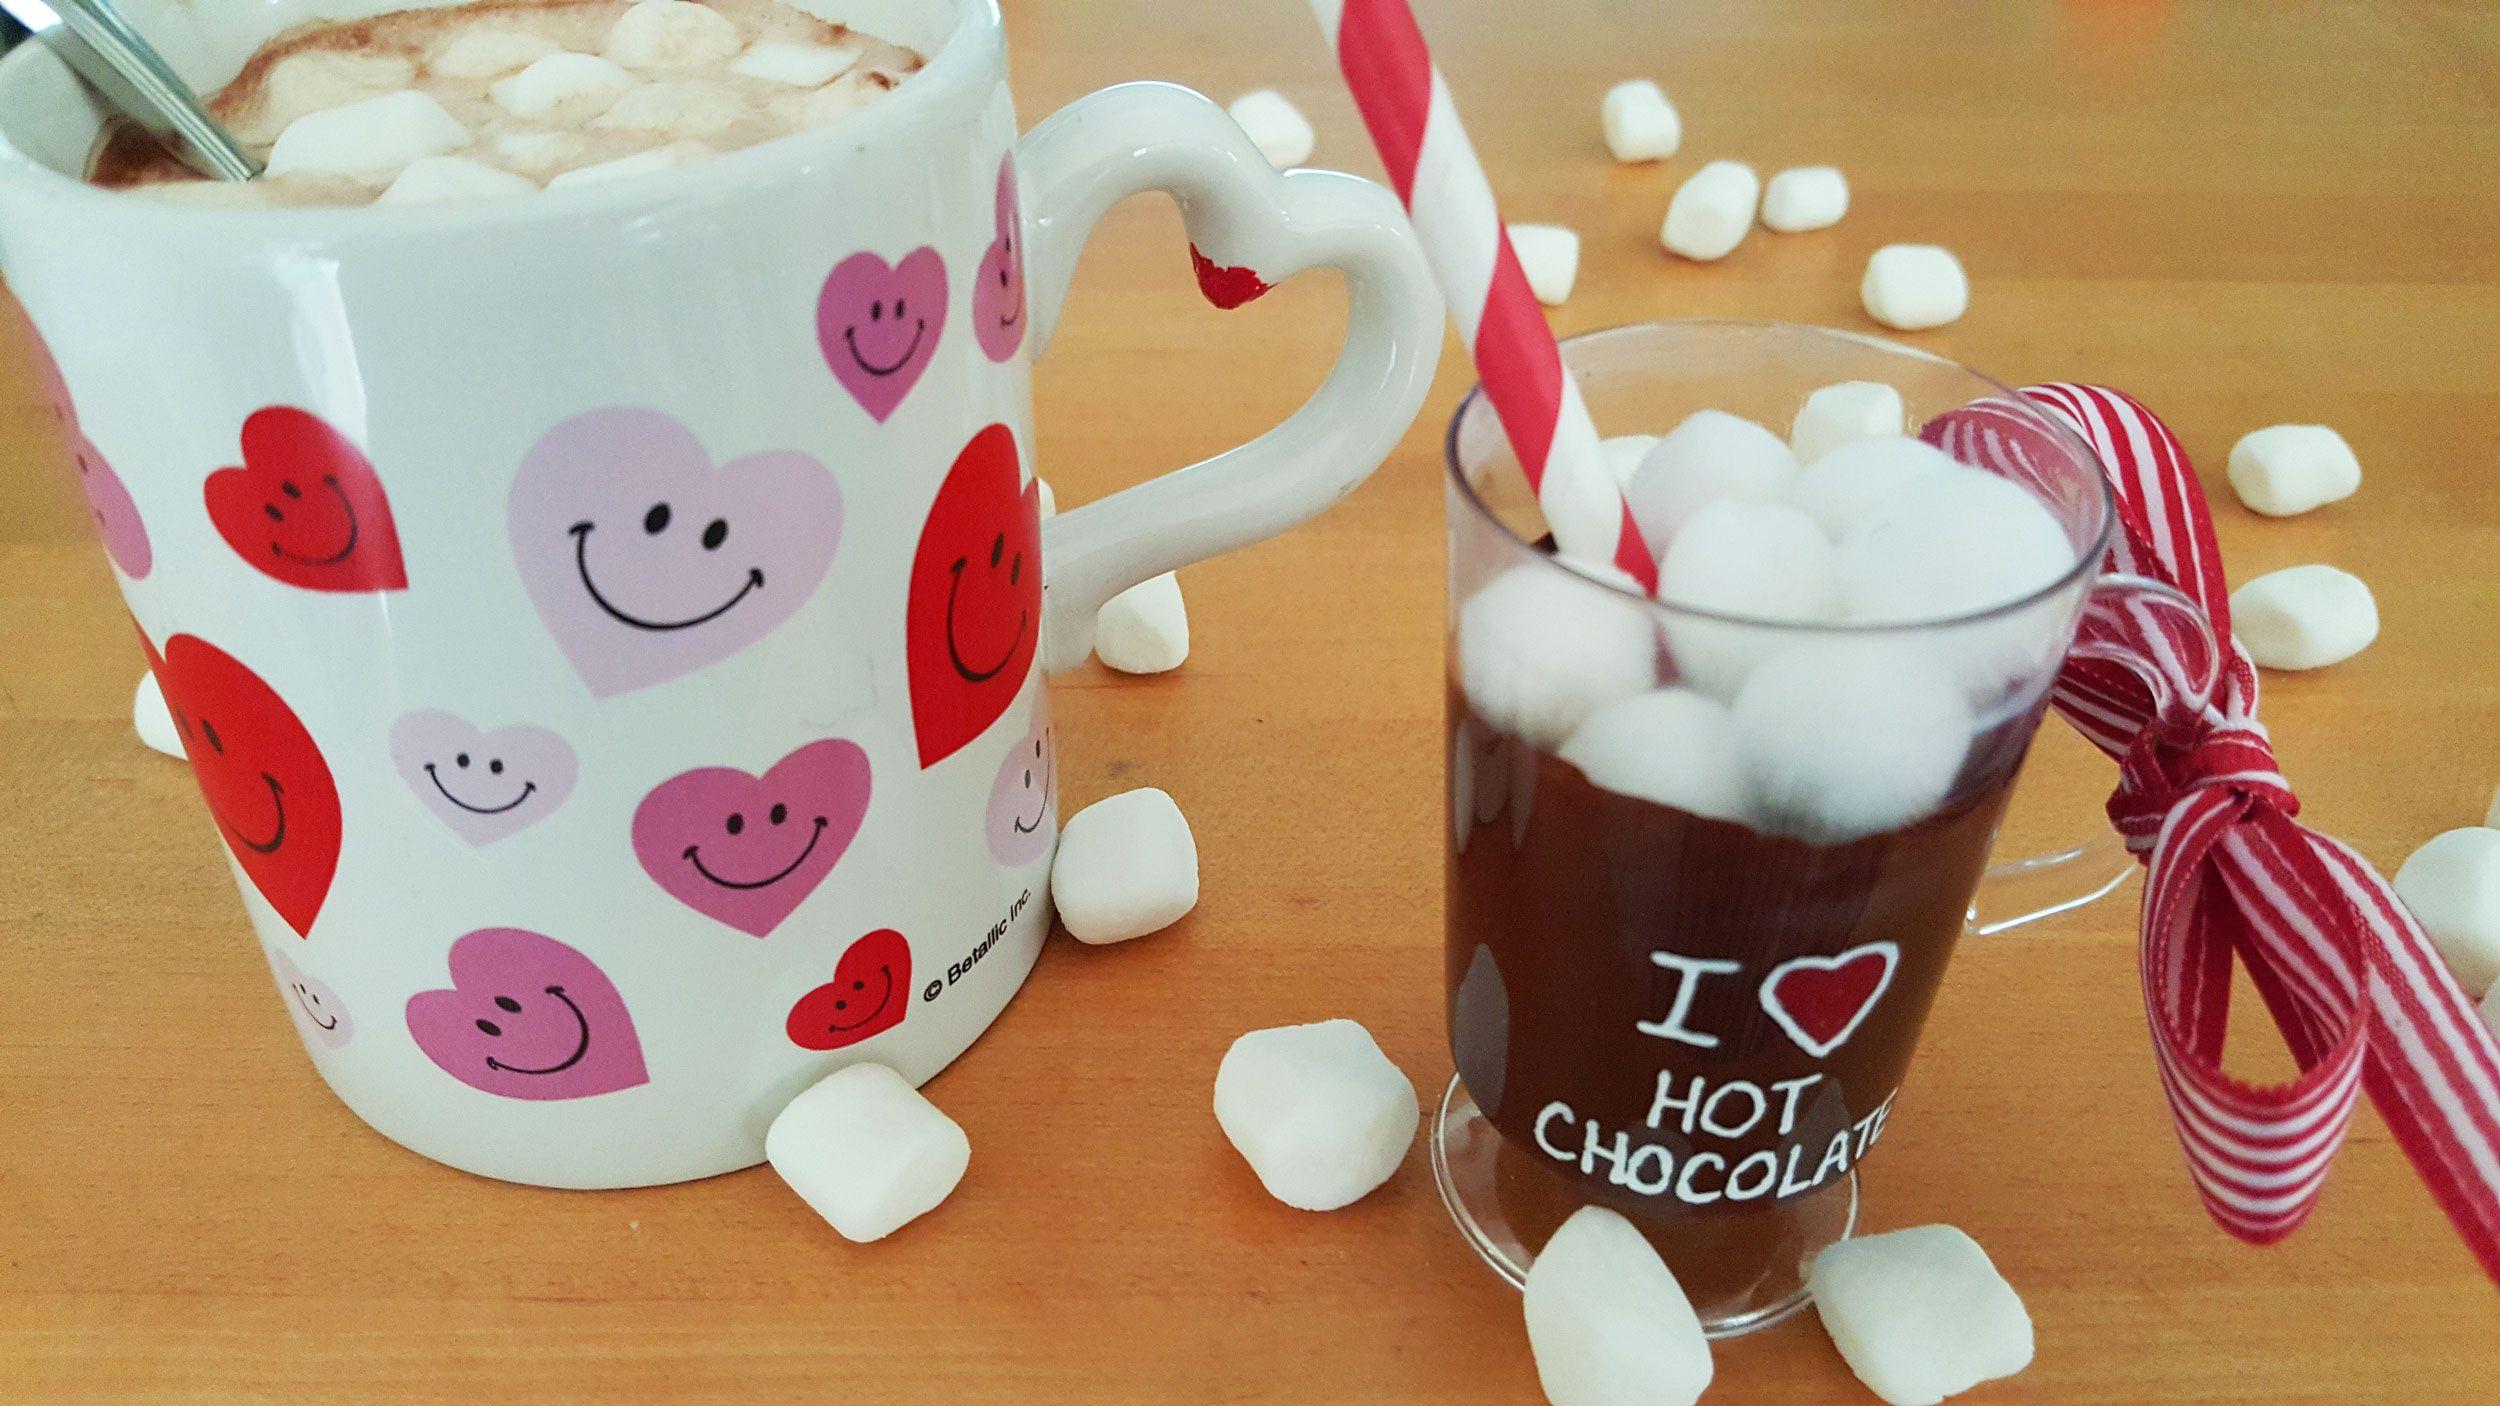 Diy hot chocolate ornament 5 steps hot chocolate